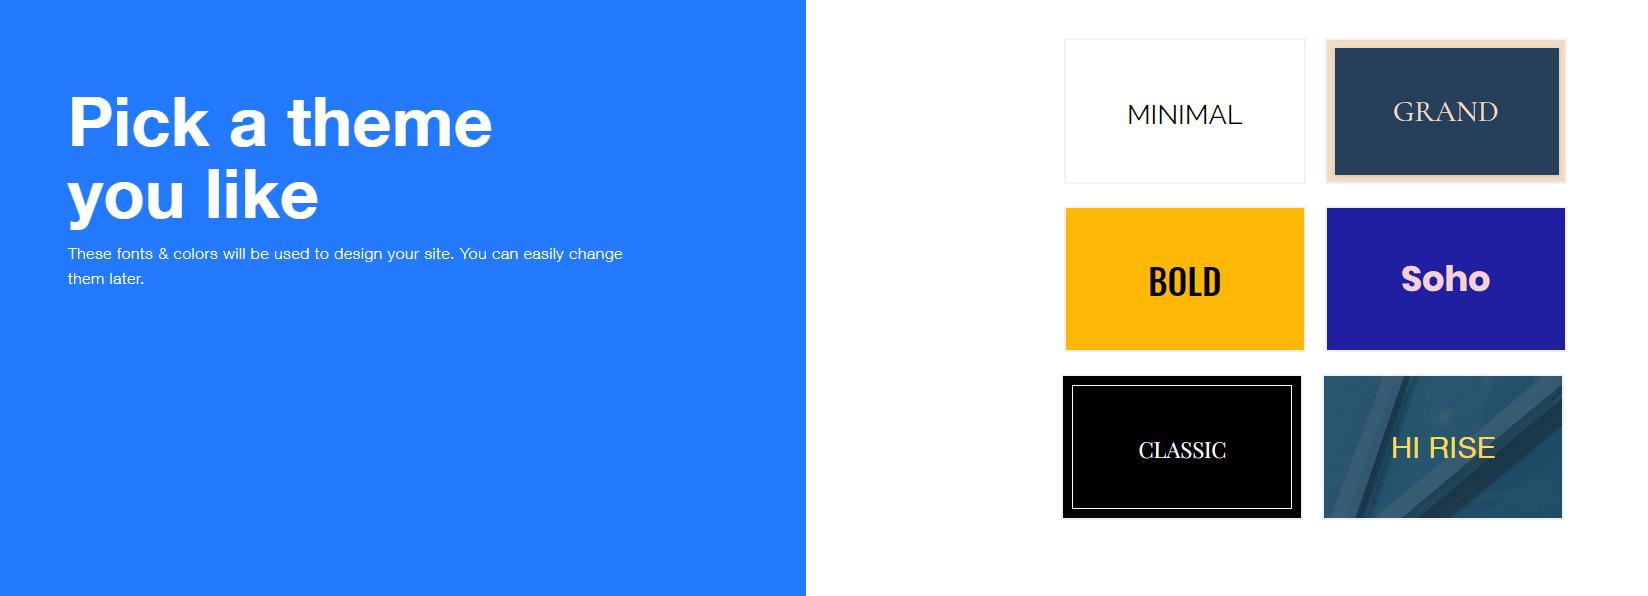 wix-adi-templates1